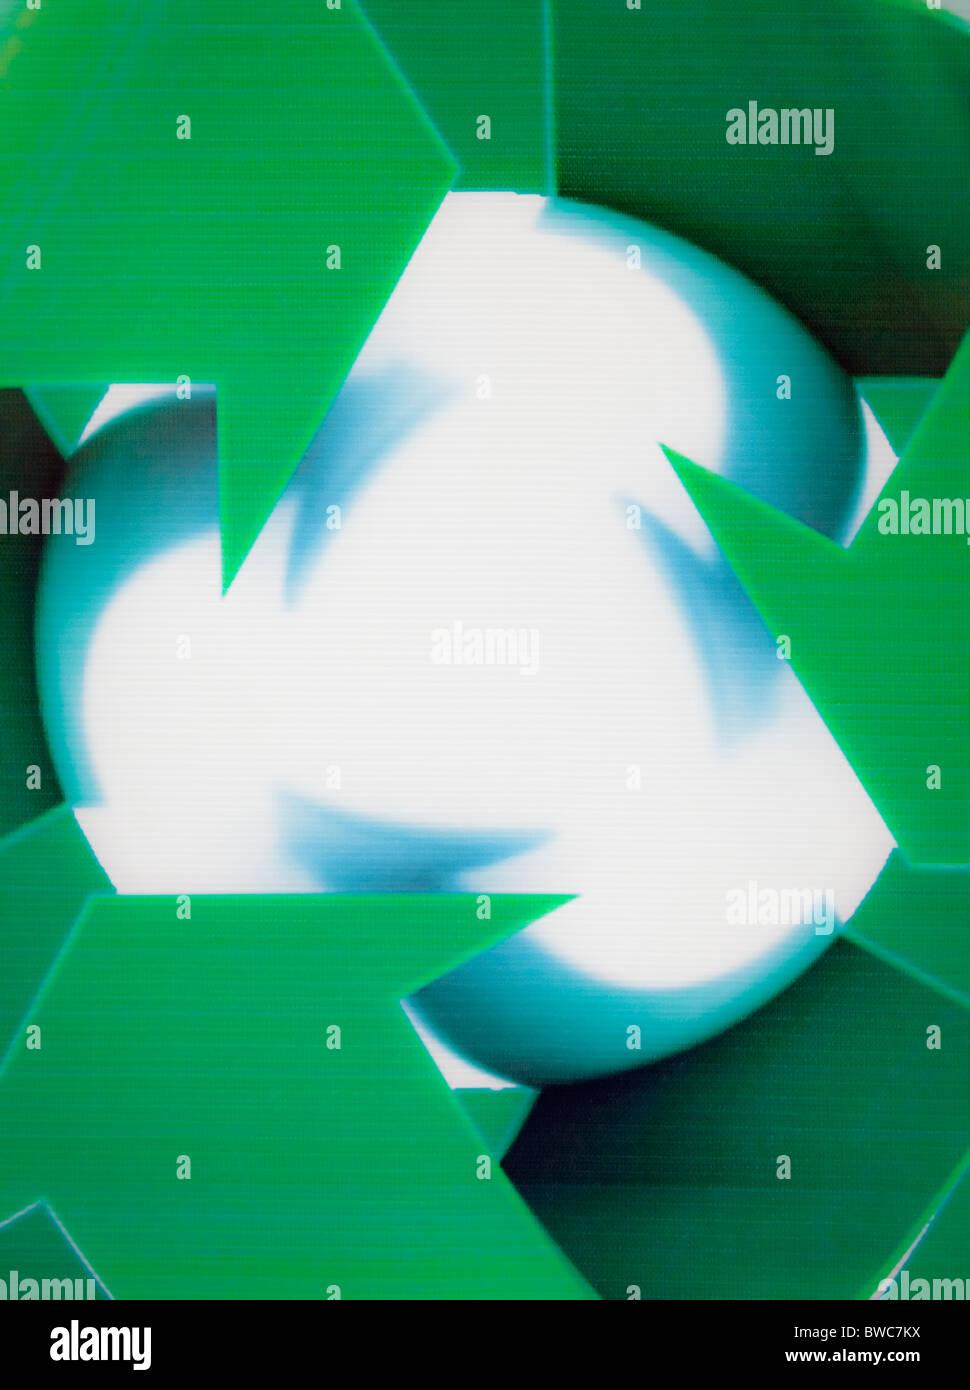 Recycling logo - Stock Image